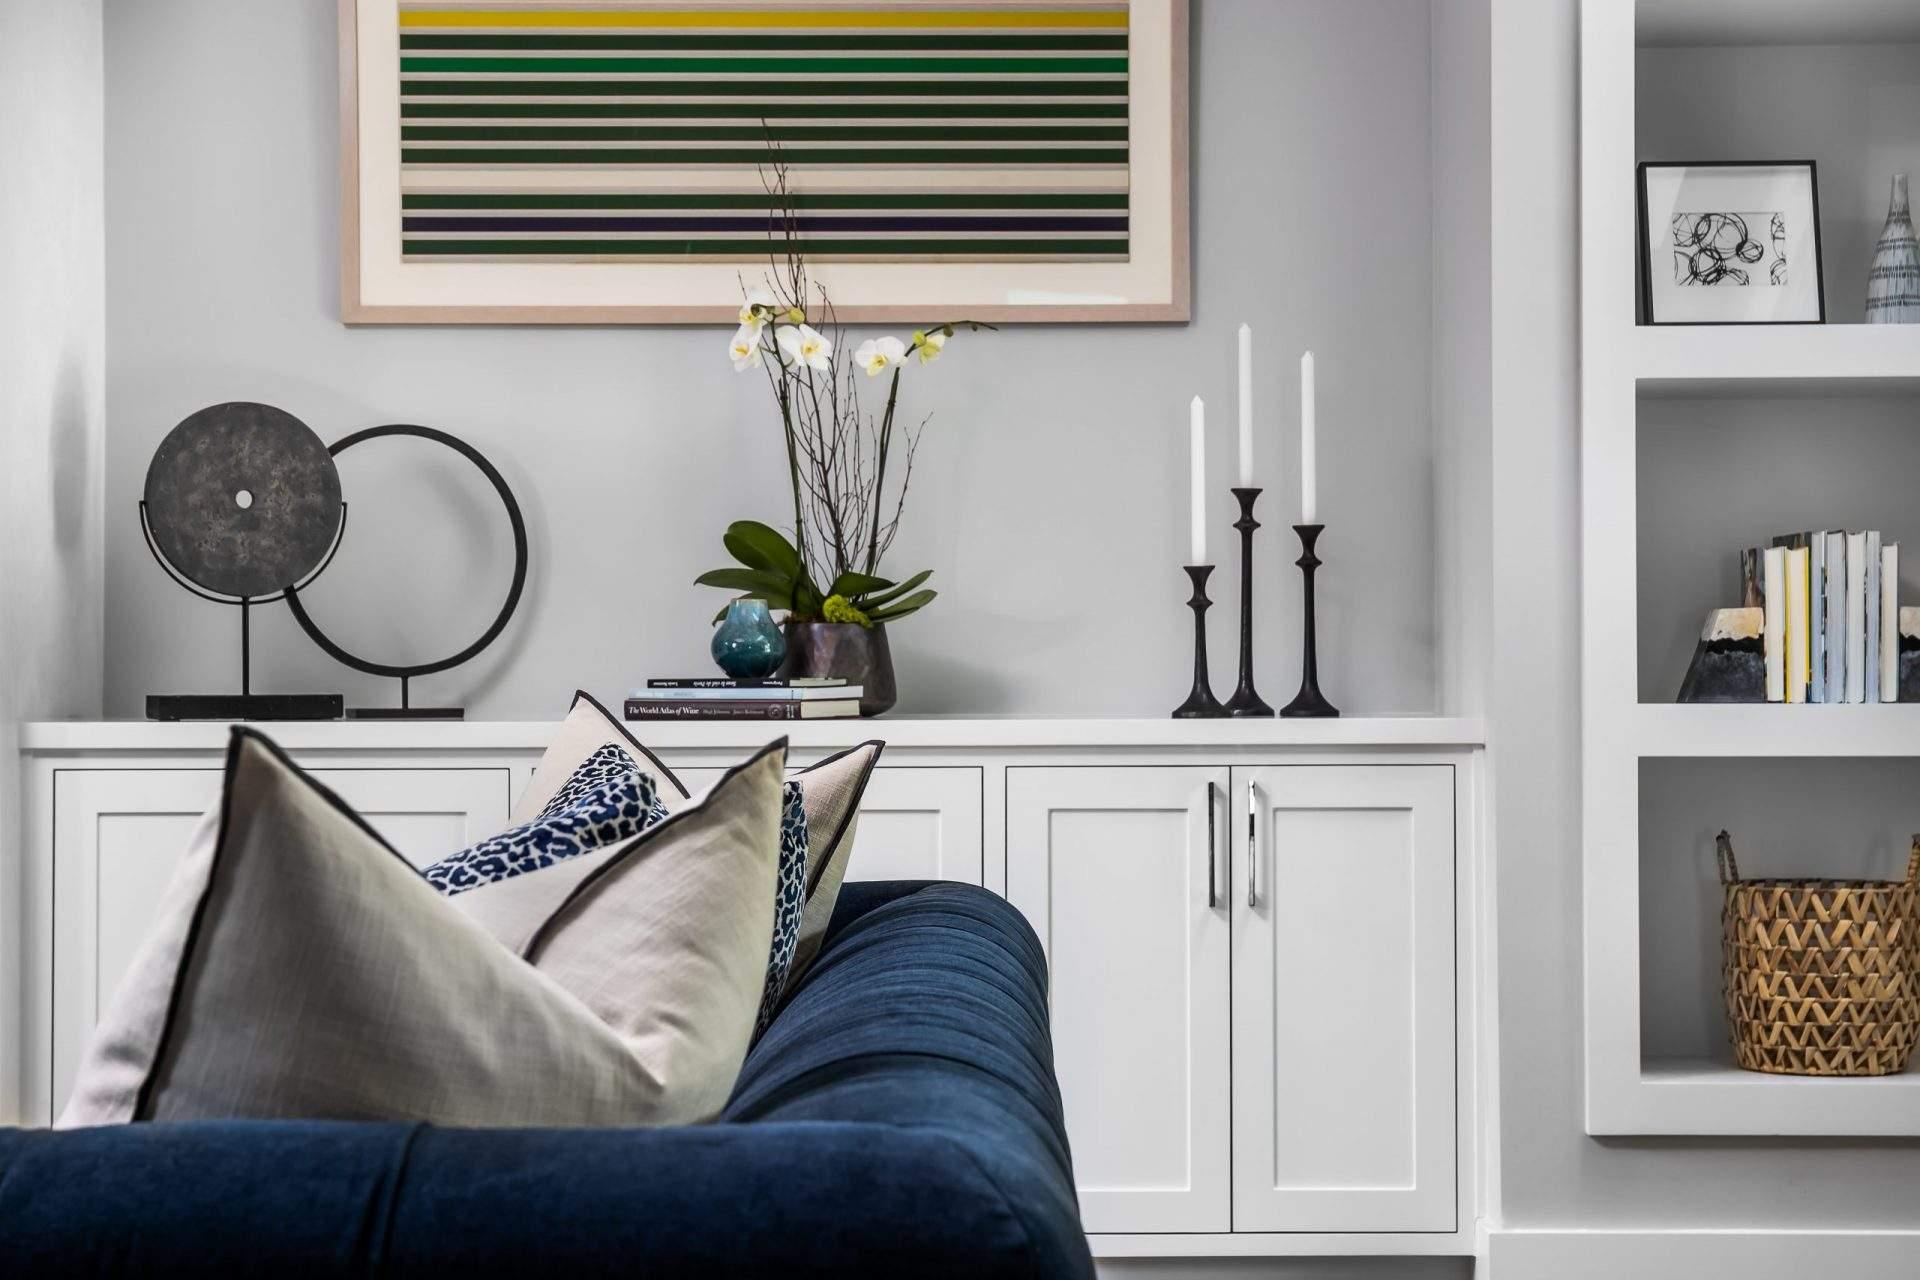 Interior Design, Sideboard with decor, Etch Interior Design, Austin, Texas